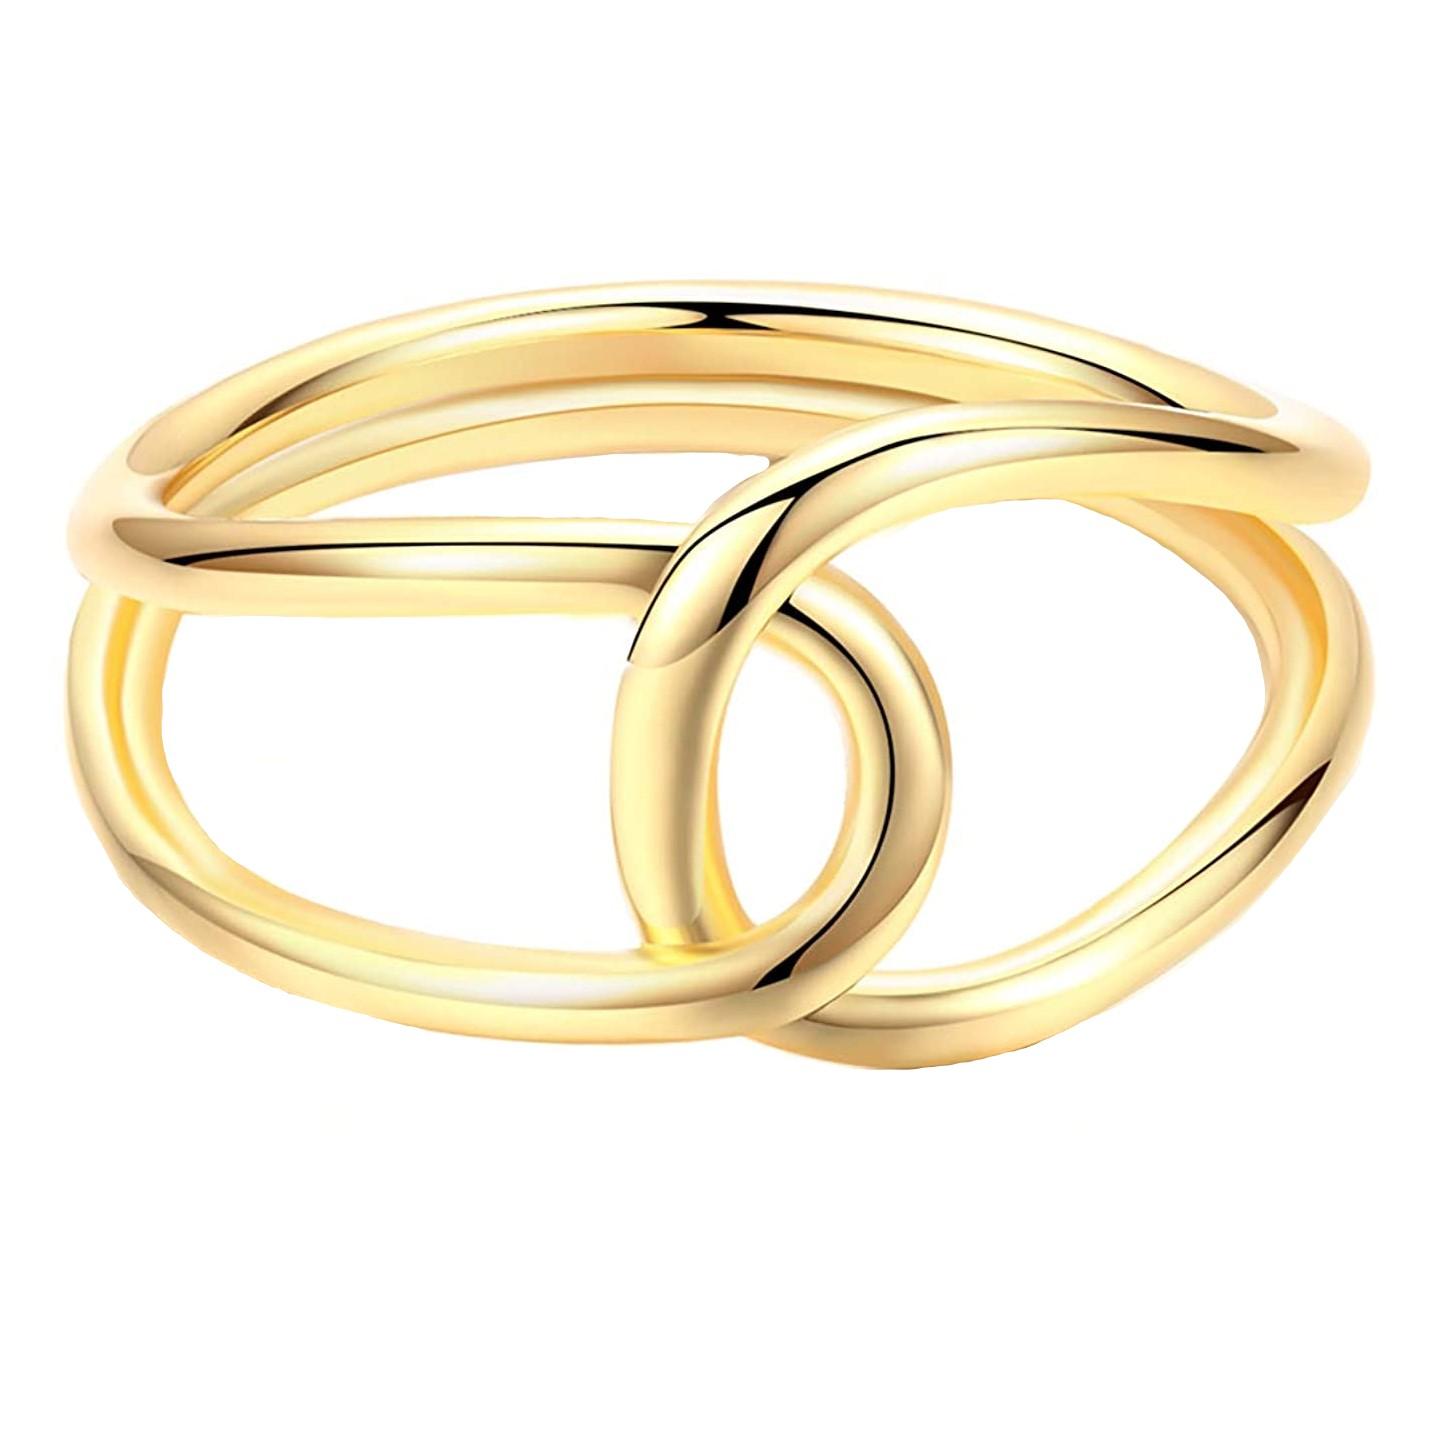 انگشتر طلا 18 عیار زنانه قیراط کد GH2087